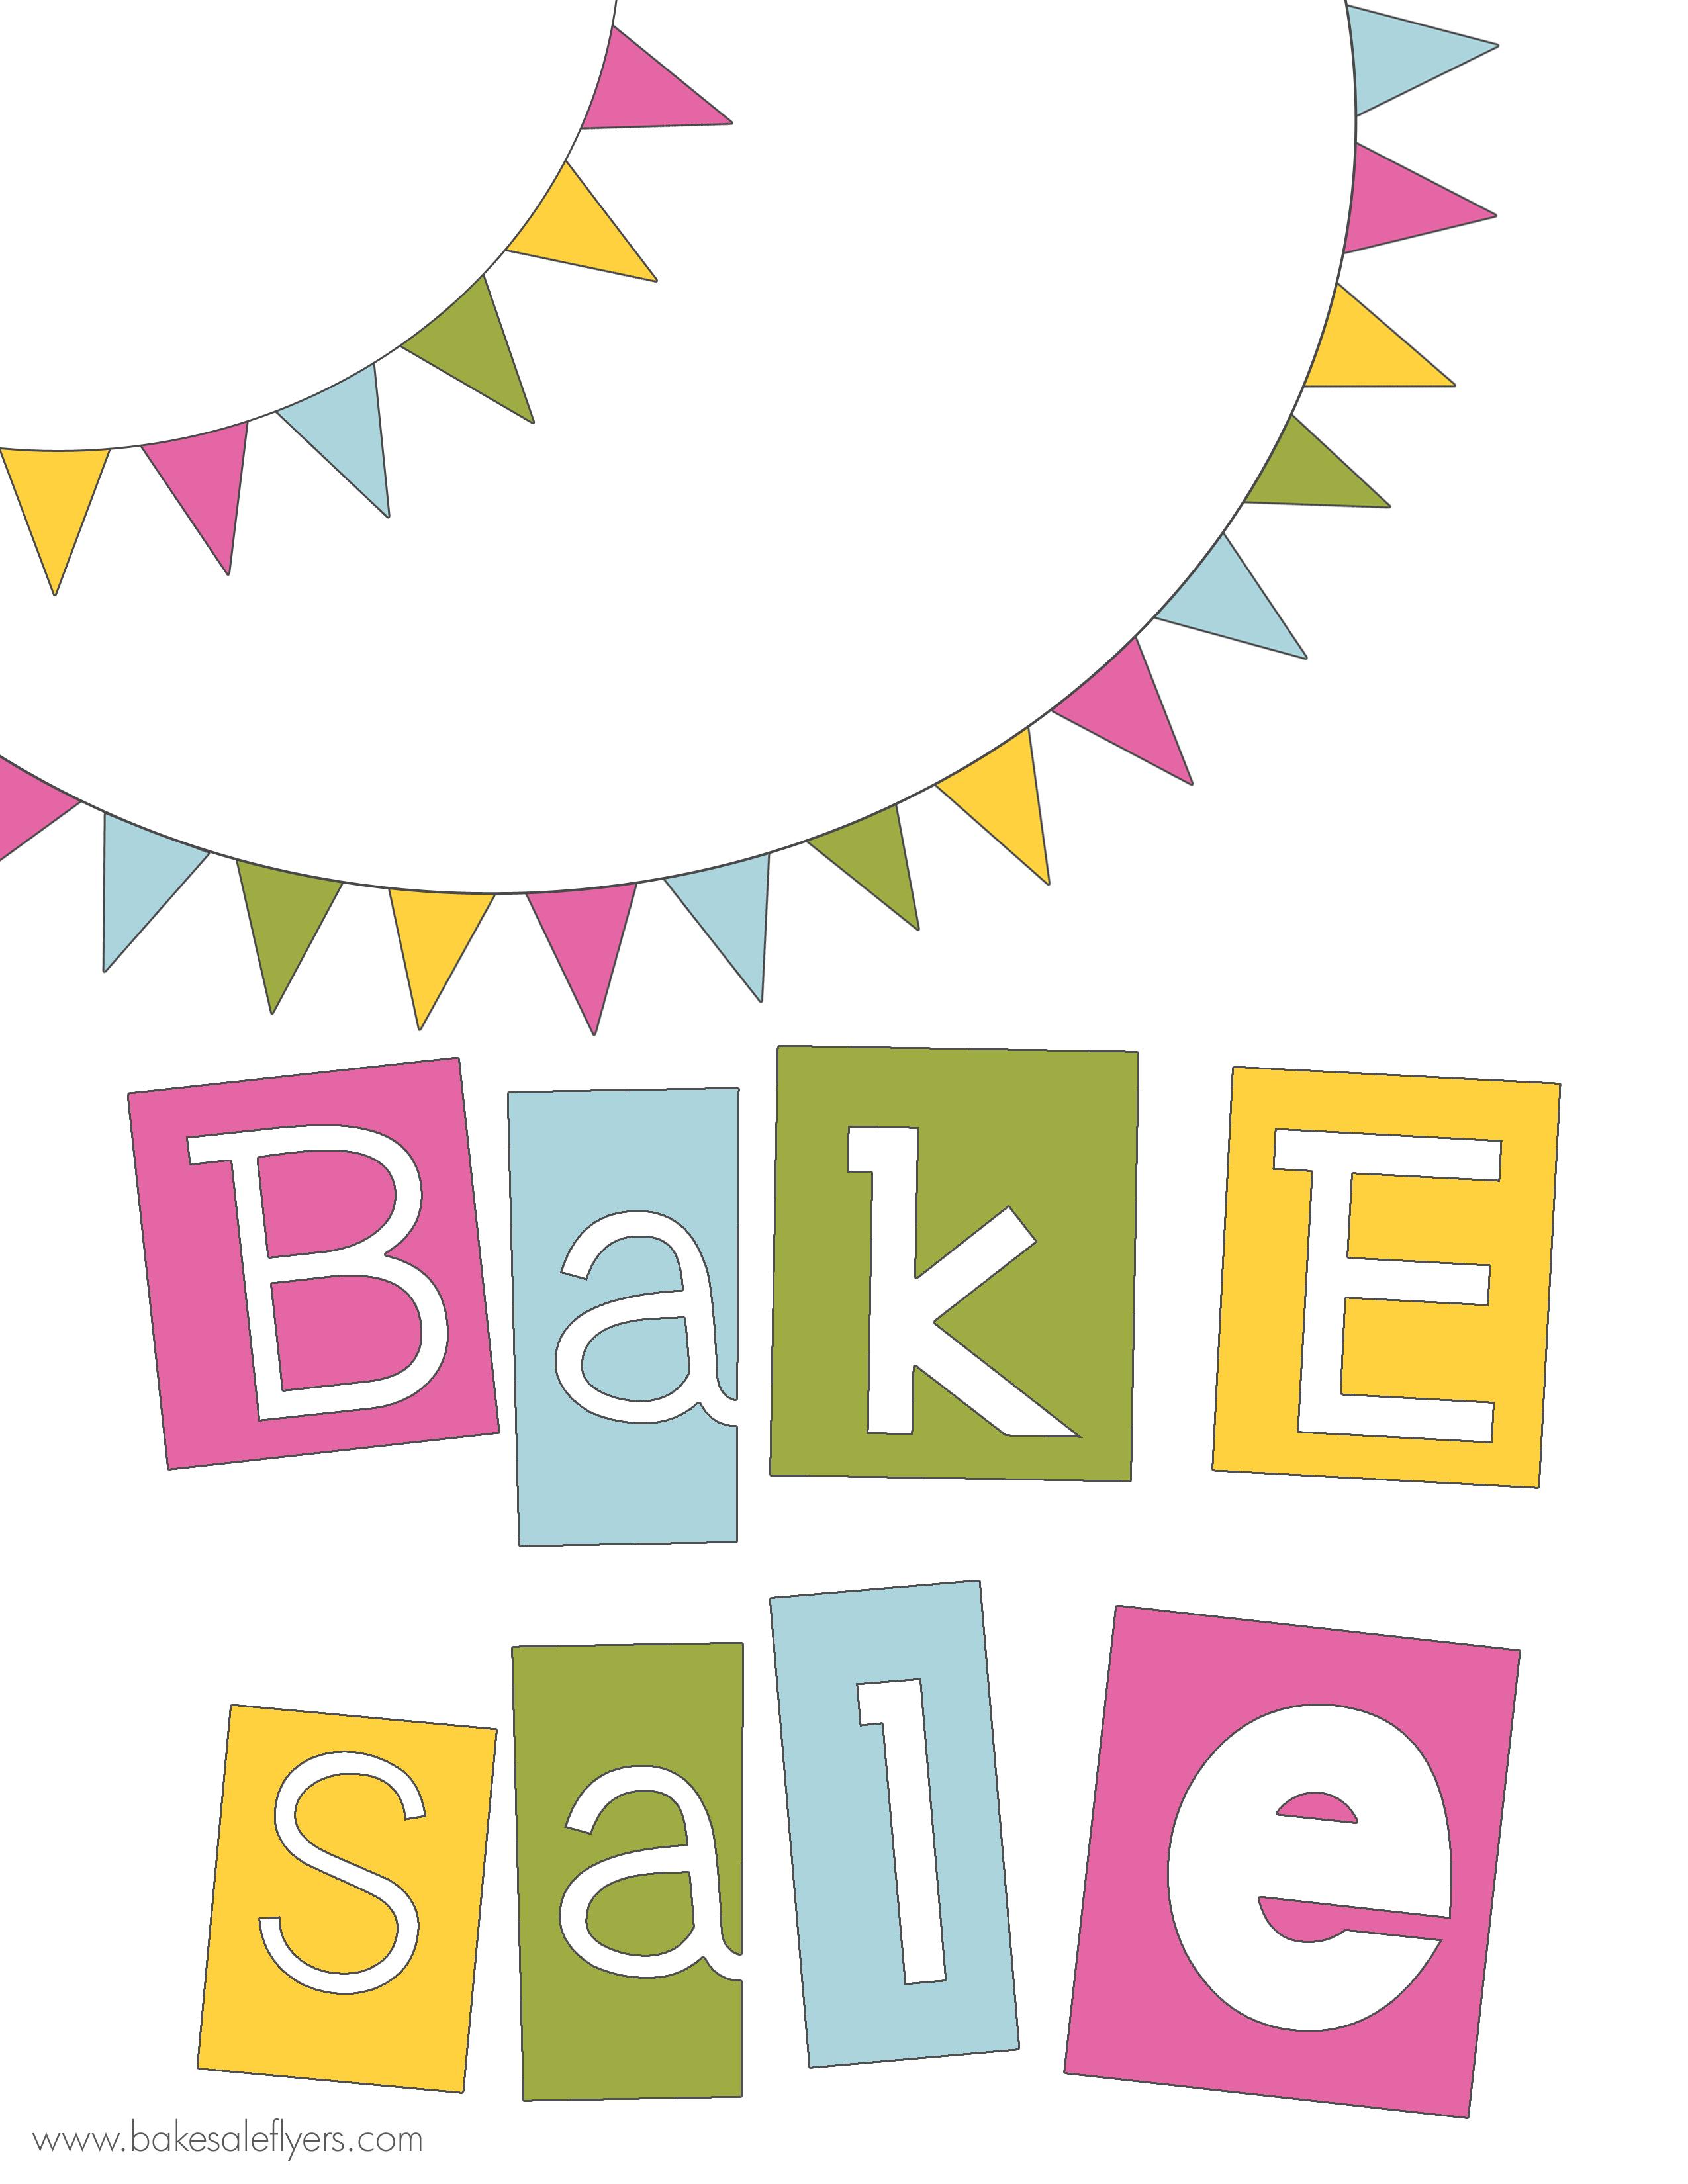 Bake Sale Fundraiser Clipart Homz Xyz-Bake Sale Fundraiser Clipart Homz Xyz-9